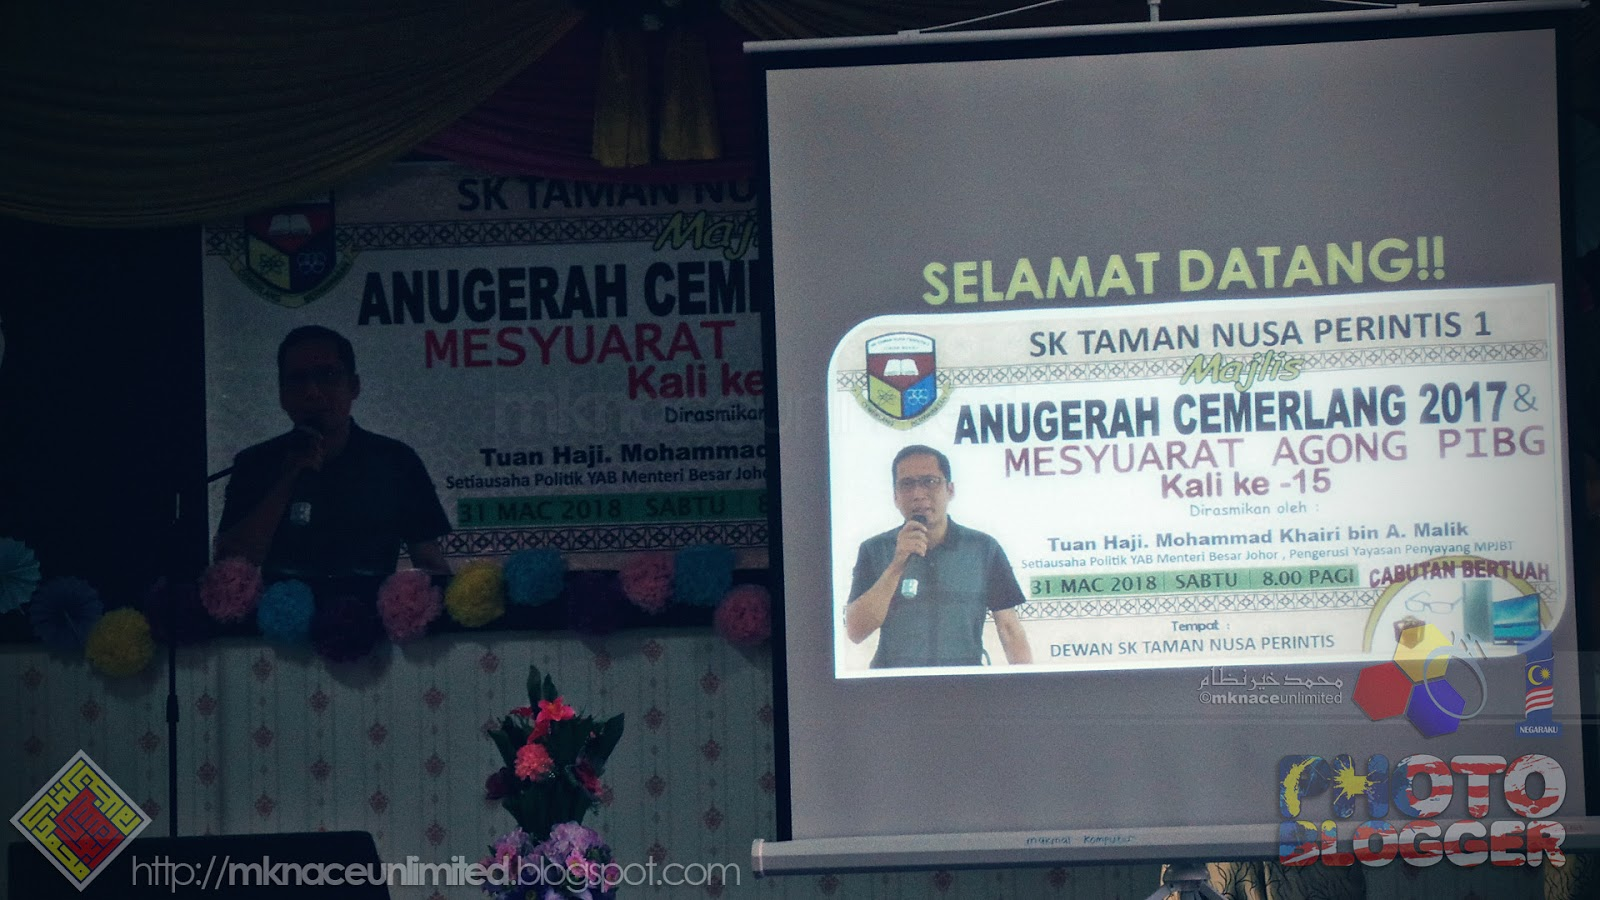 Sk Taman Nusa Perintis Majlis Anugerah Cemerlang 2017 Mesyuarat Roti Tissue By Canai Ikhwan Gh Corner Mks Lepak Menanti